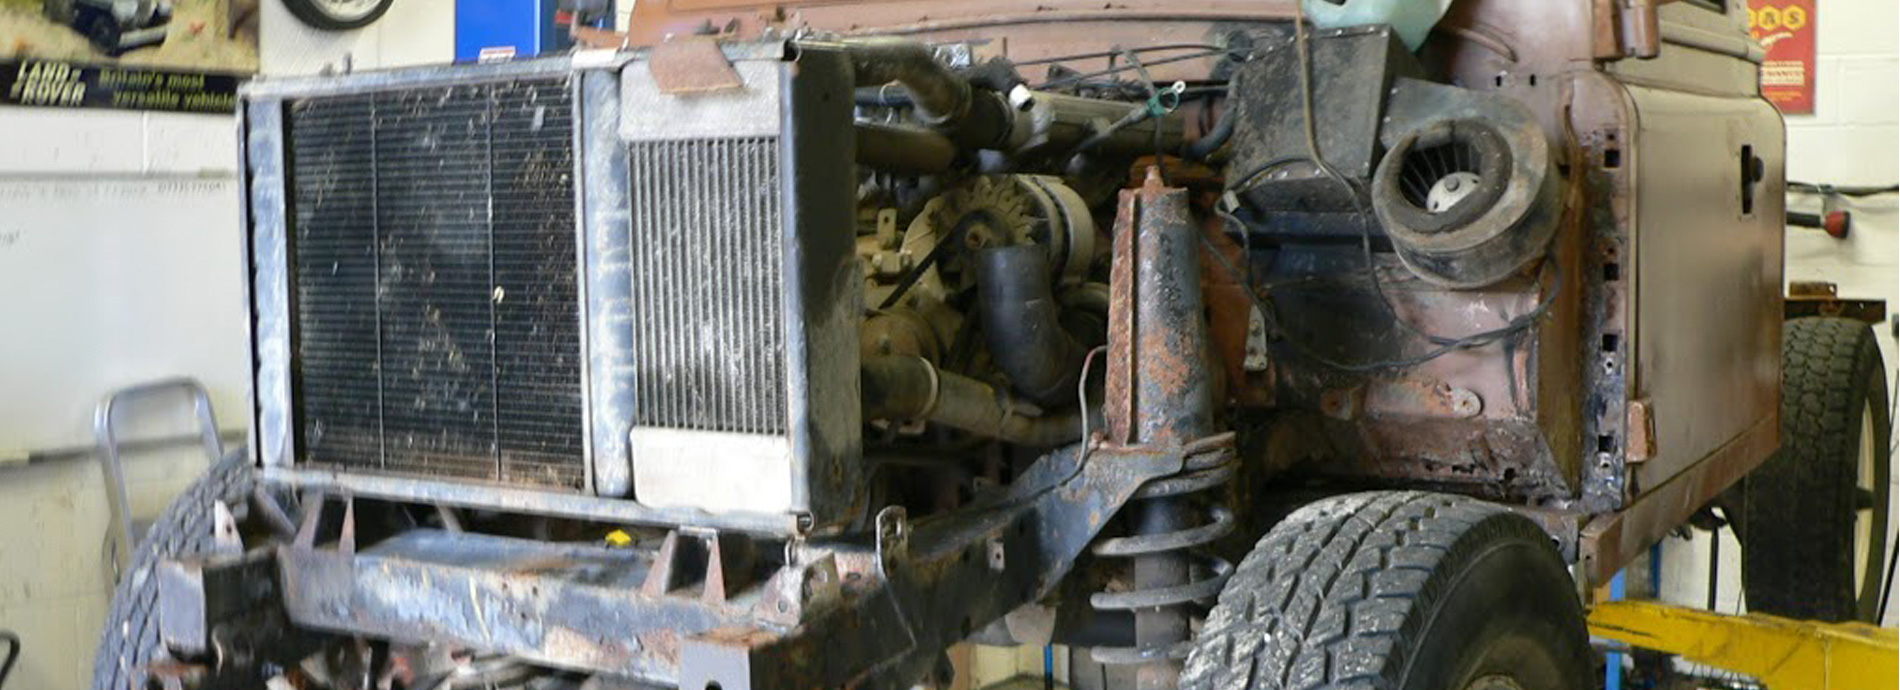 Restoring an old landrover